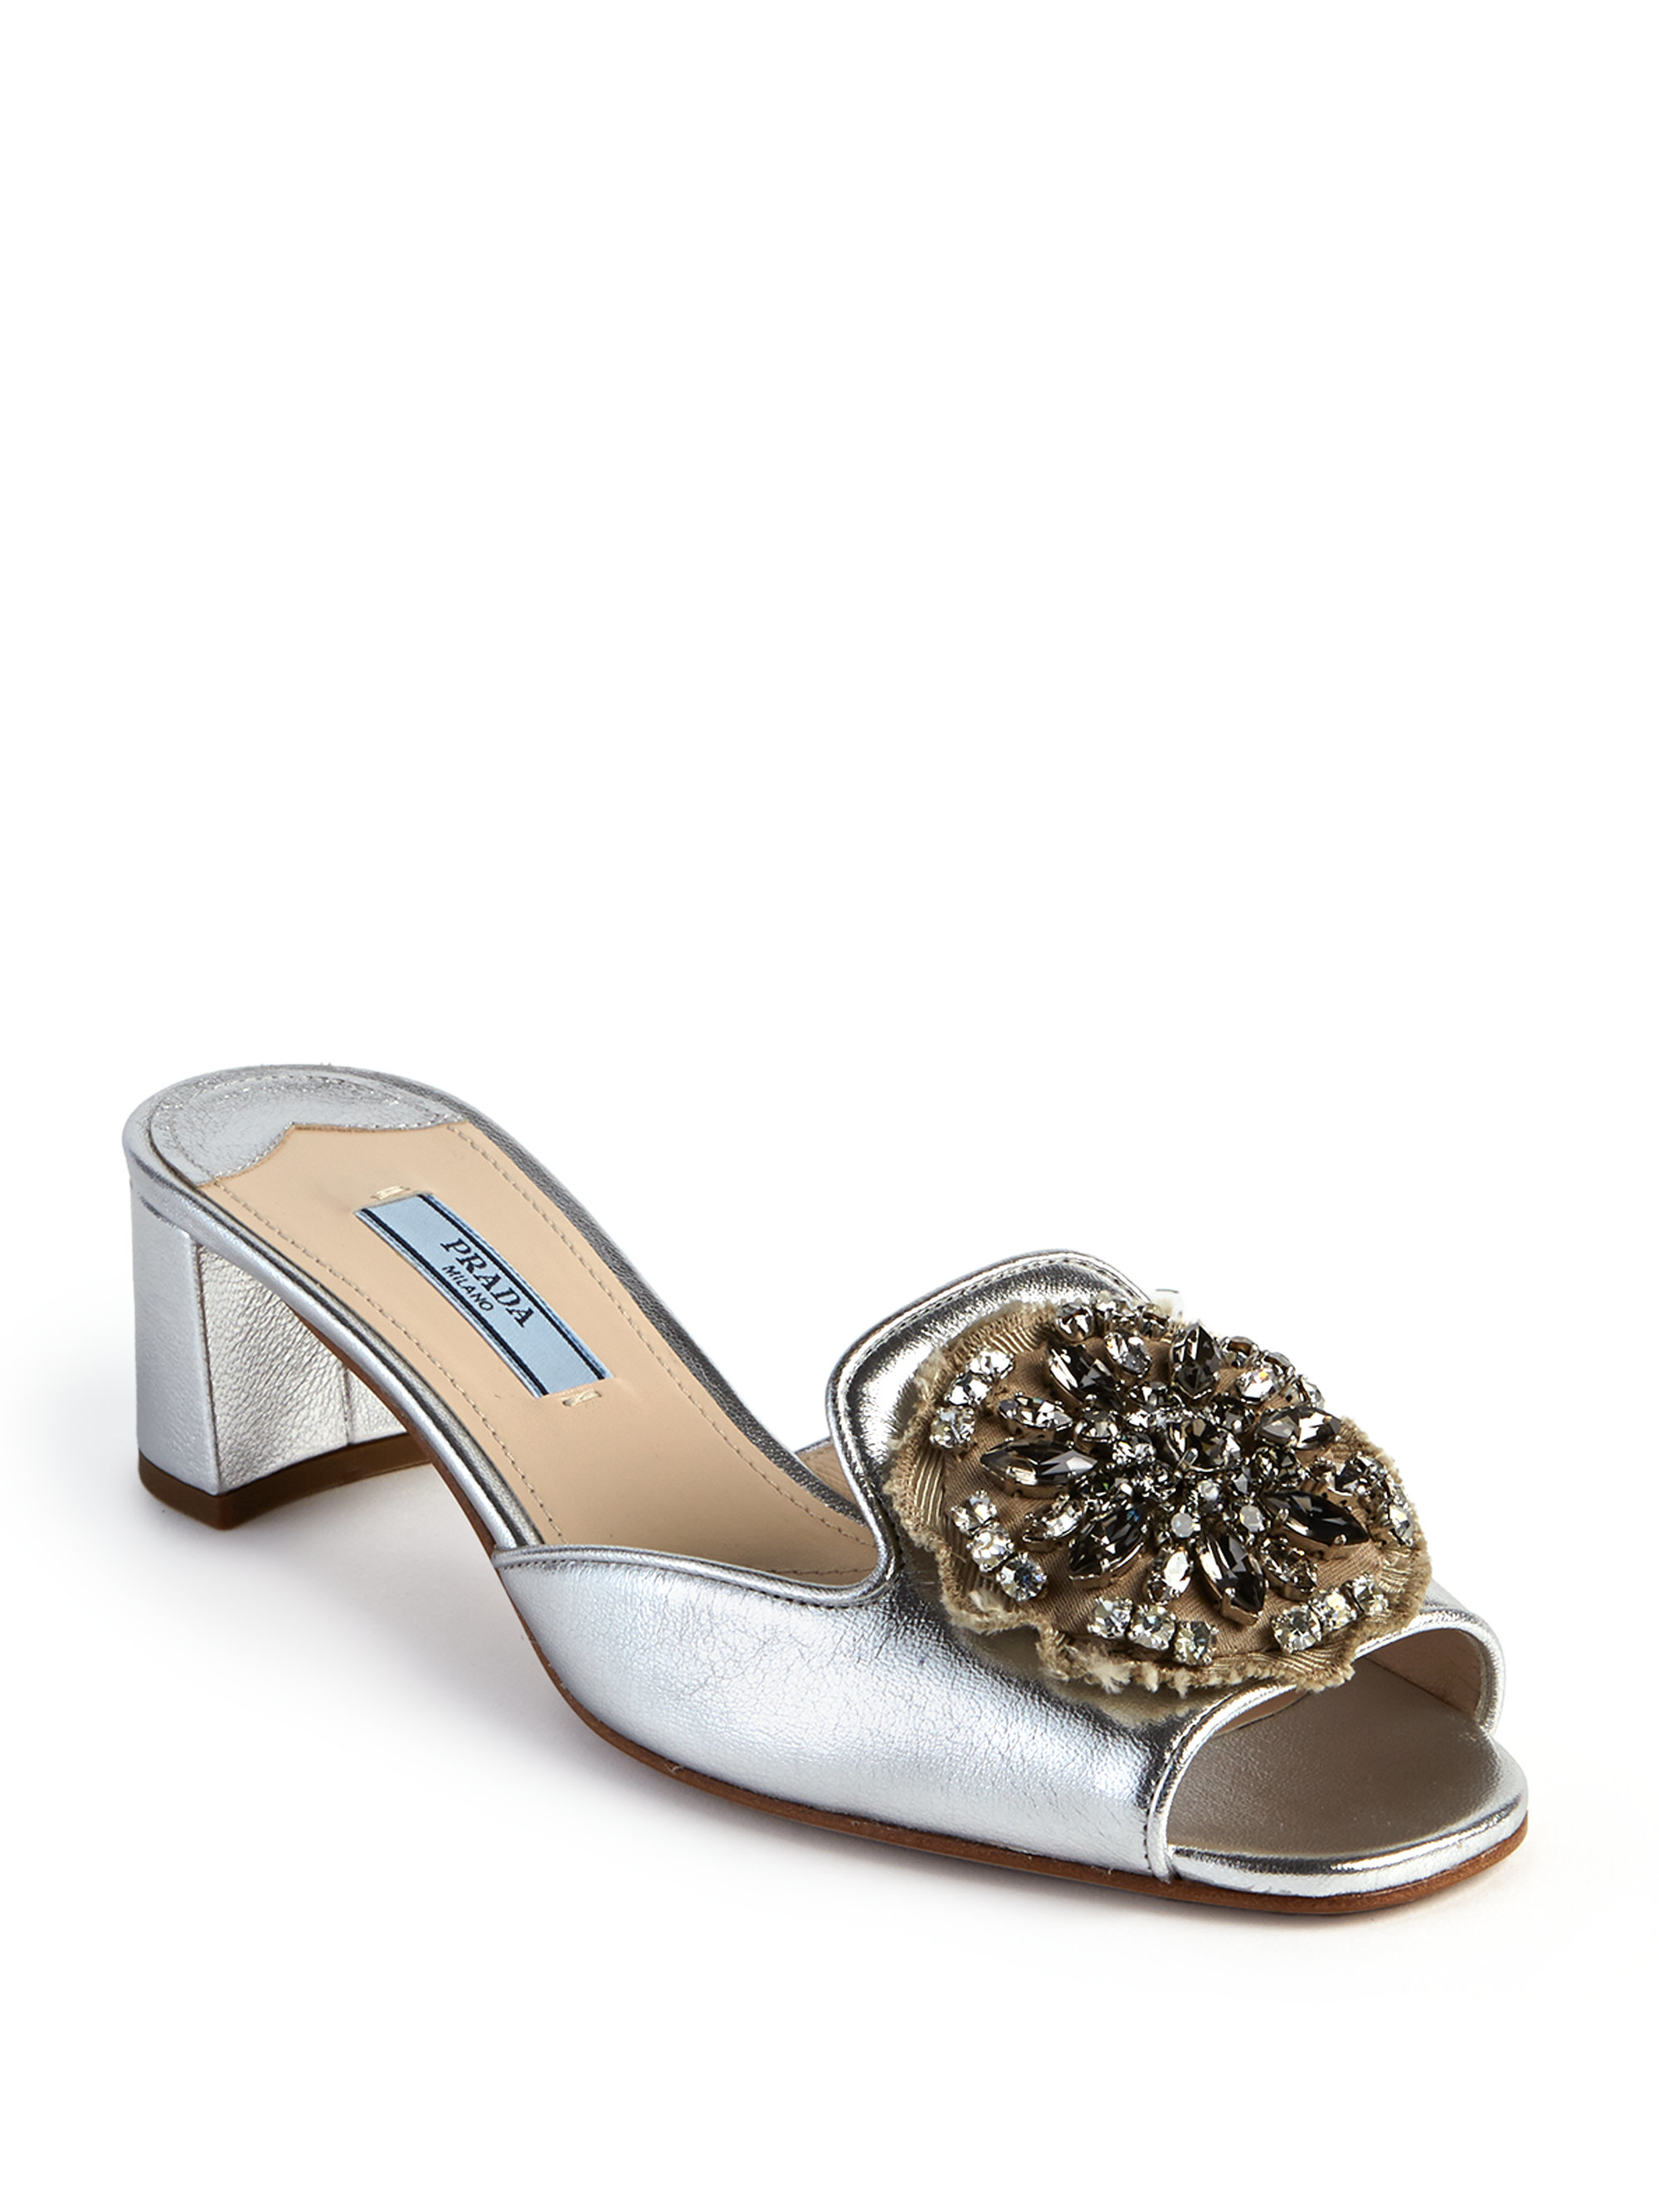 b1e526253eabd Lyst - Prada Embellished Metallic Leather Mule Sandals in White